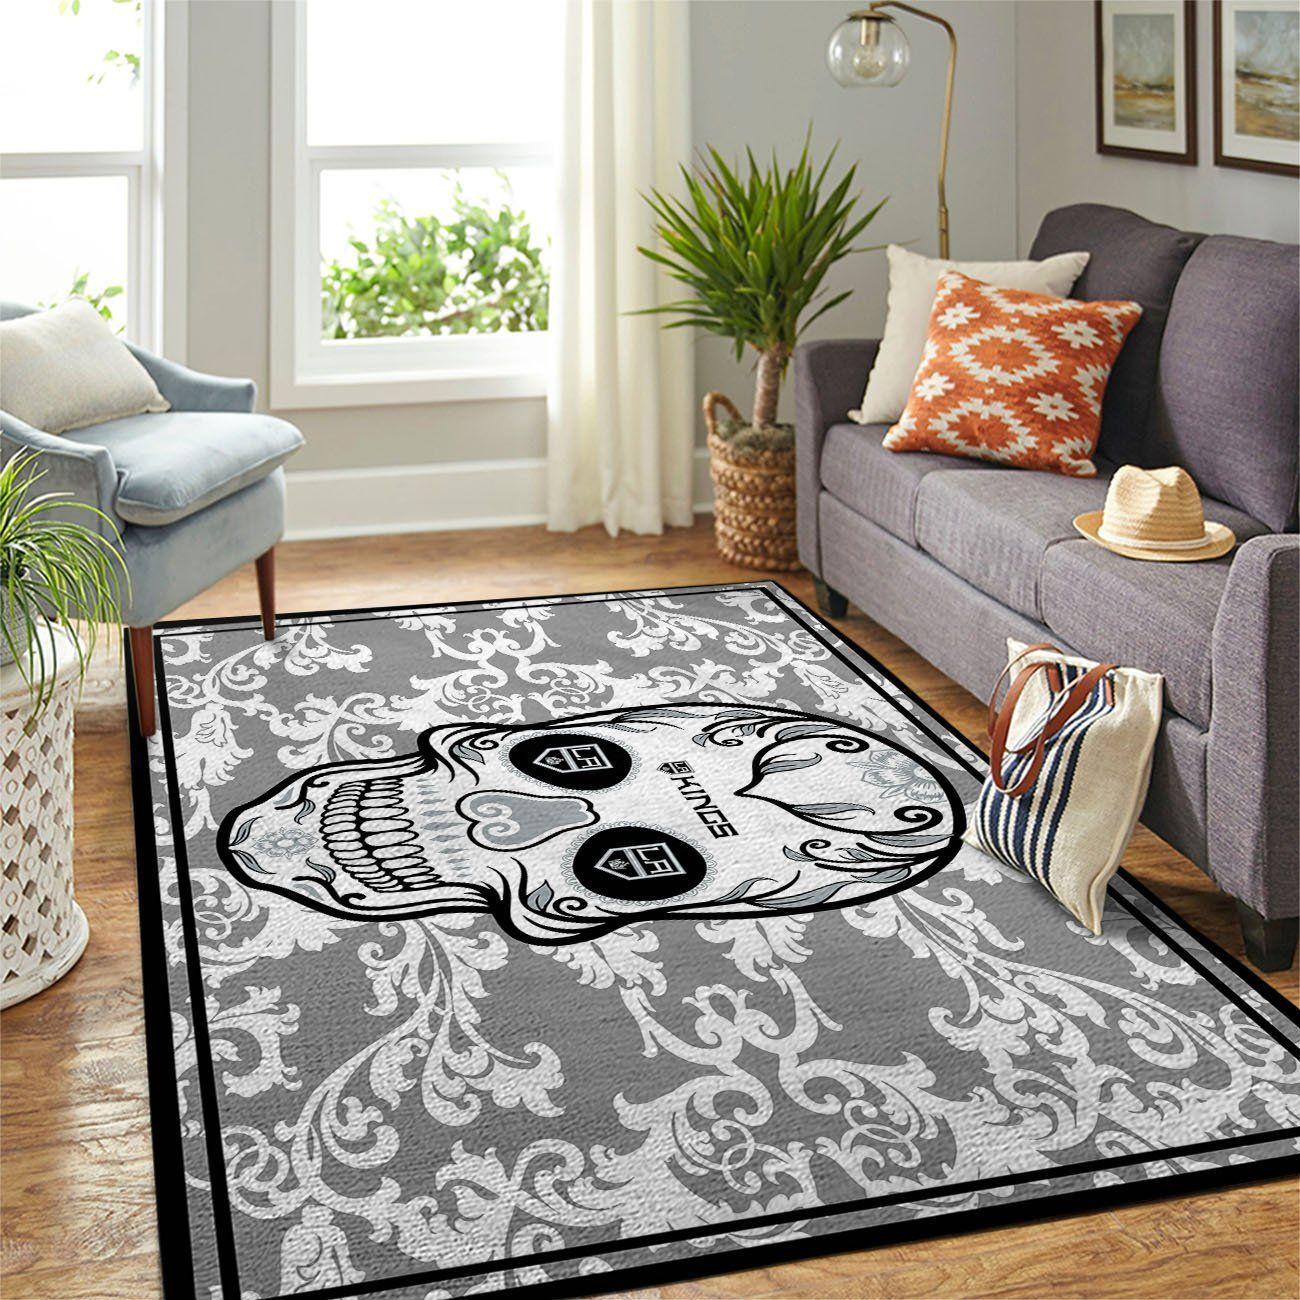 Amazon Los Angeles Kings Living Room Area No3616 Rug